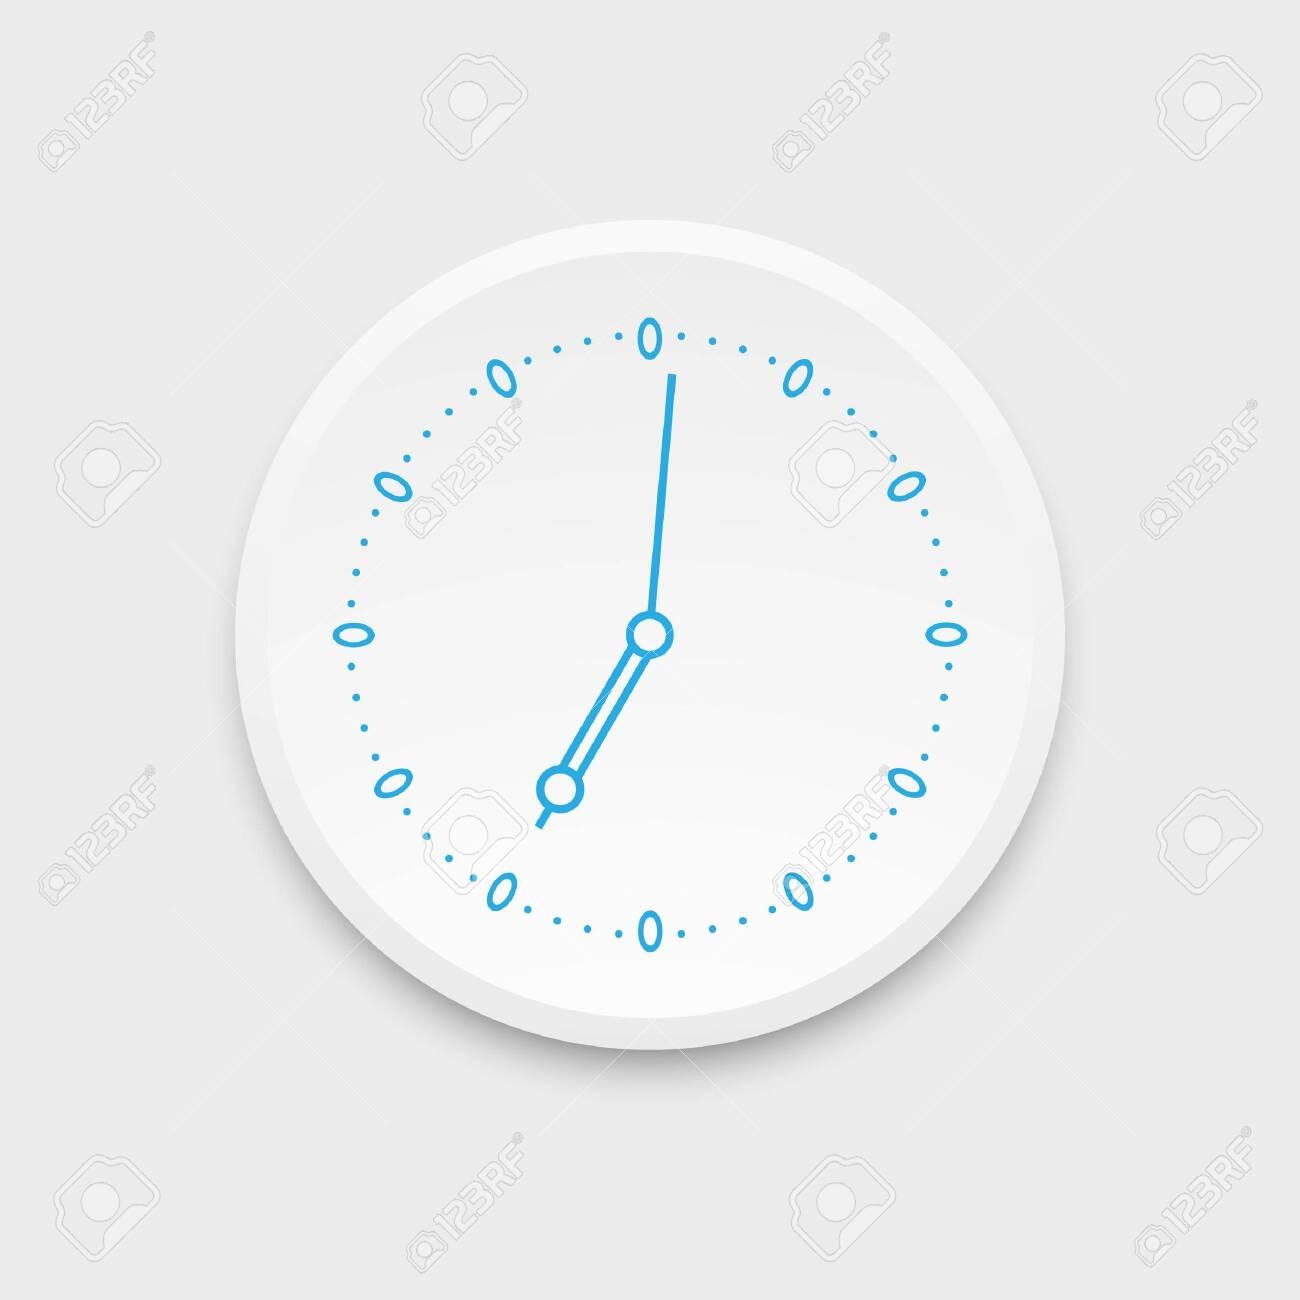 Clock icon. Vector illustration. - 151617536